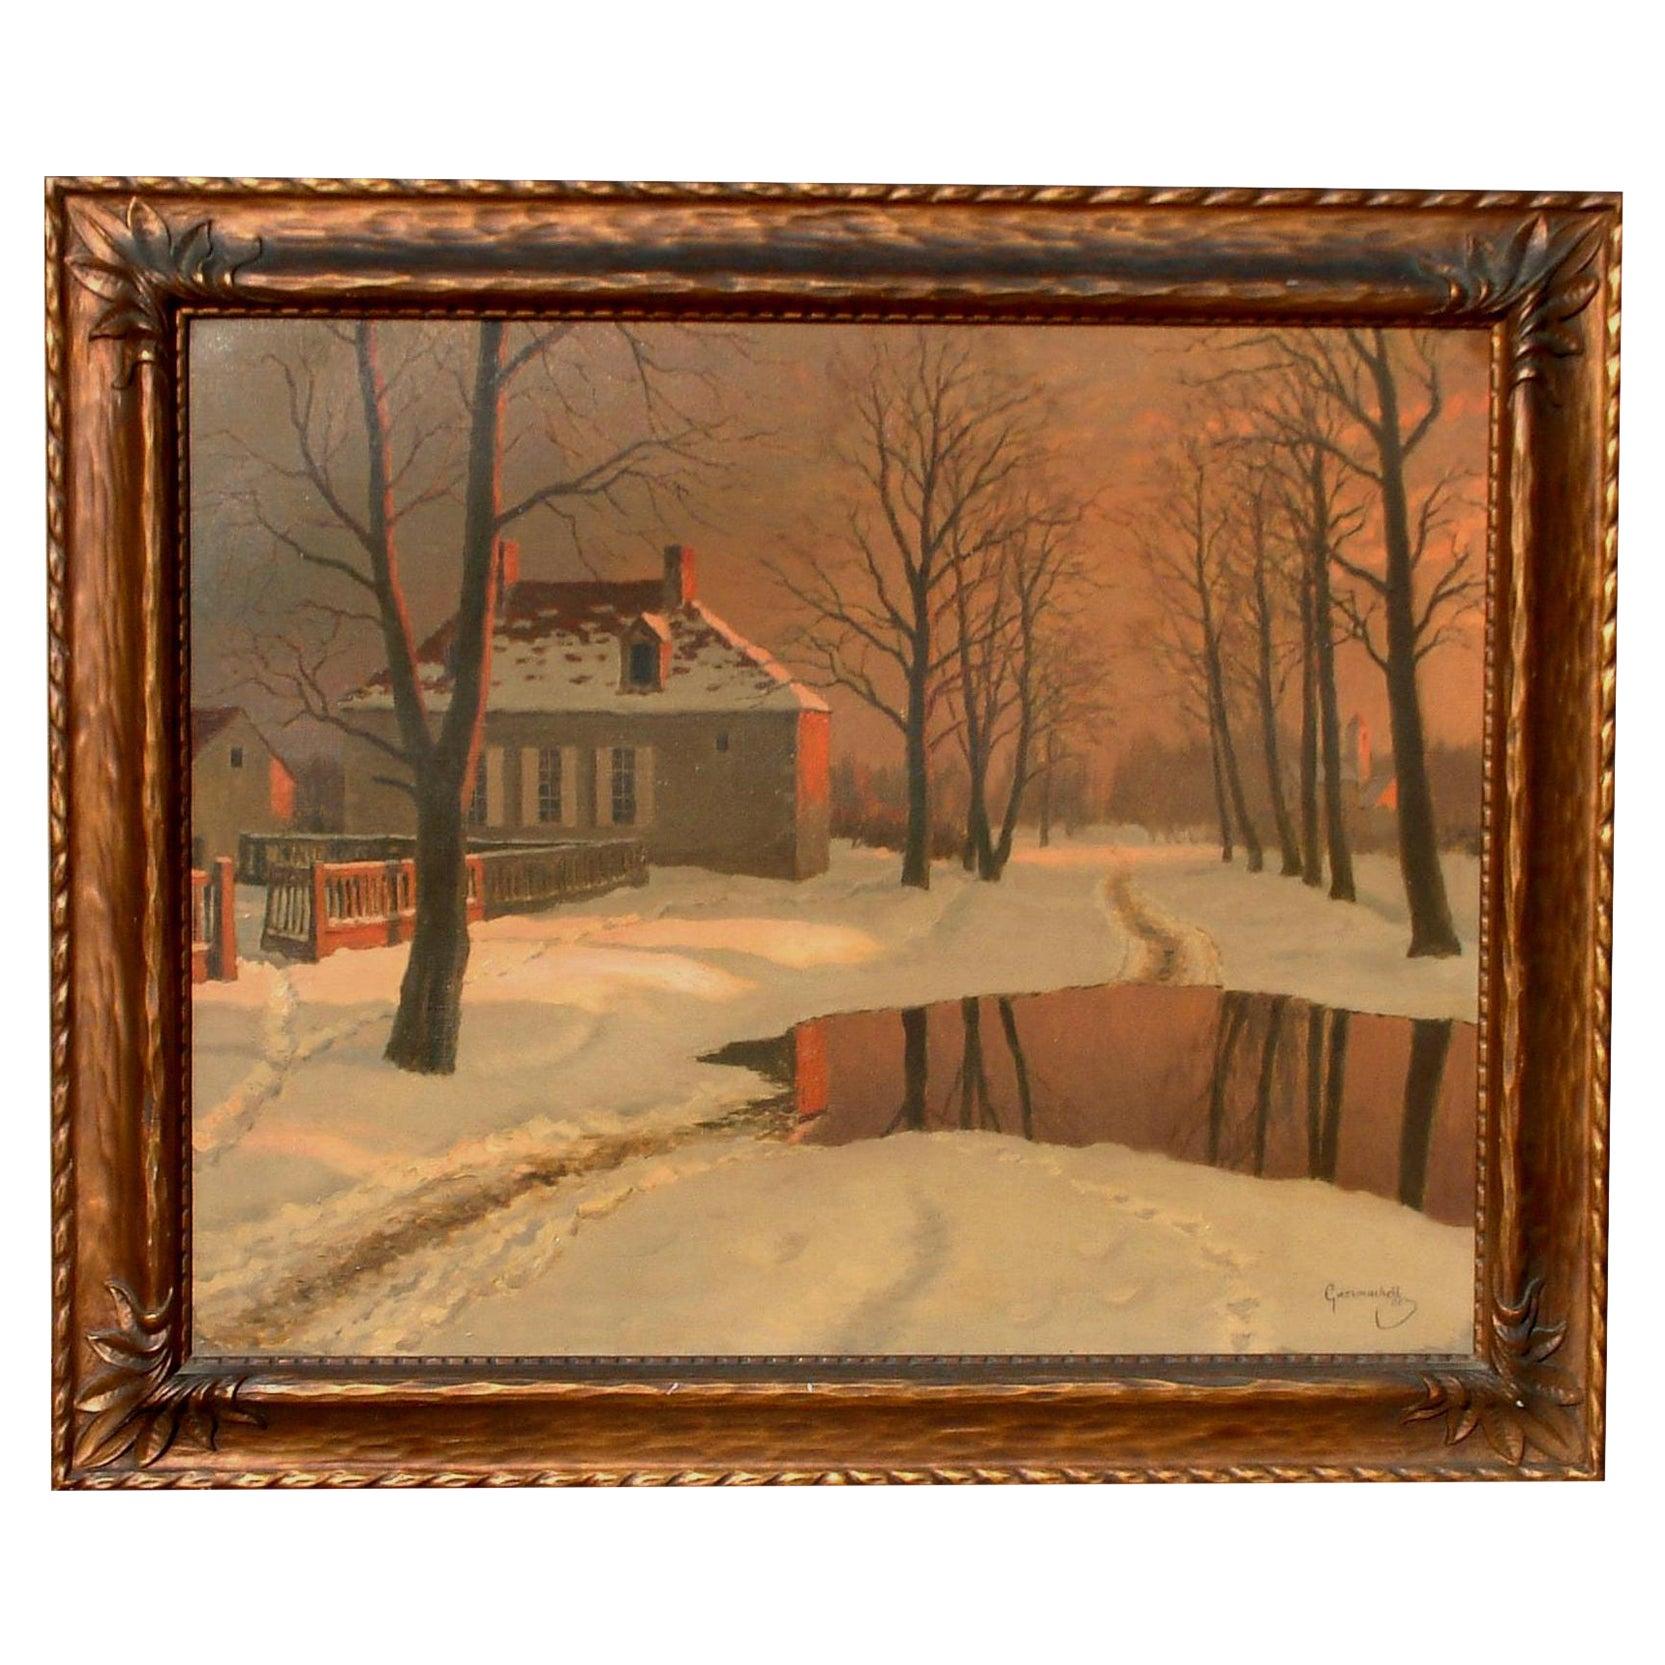 Mikhail Germachev Russian Artist Winter Snow Scene, Oil on Canvas